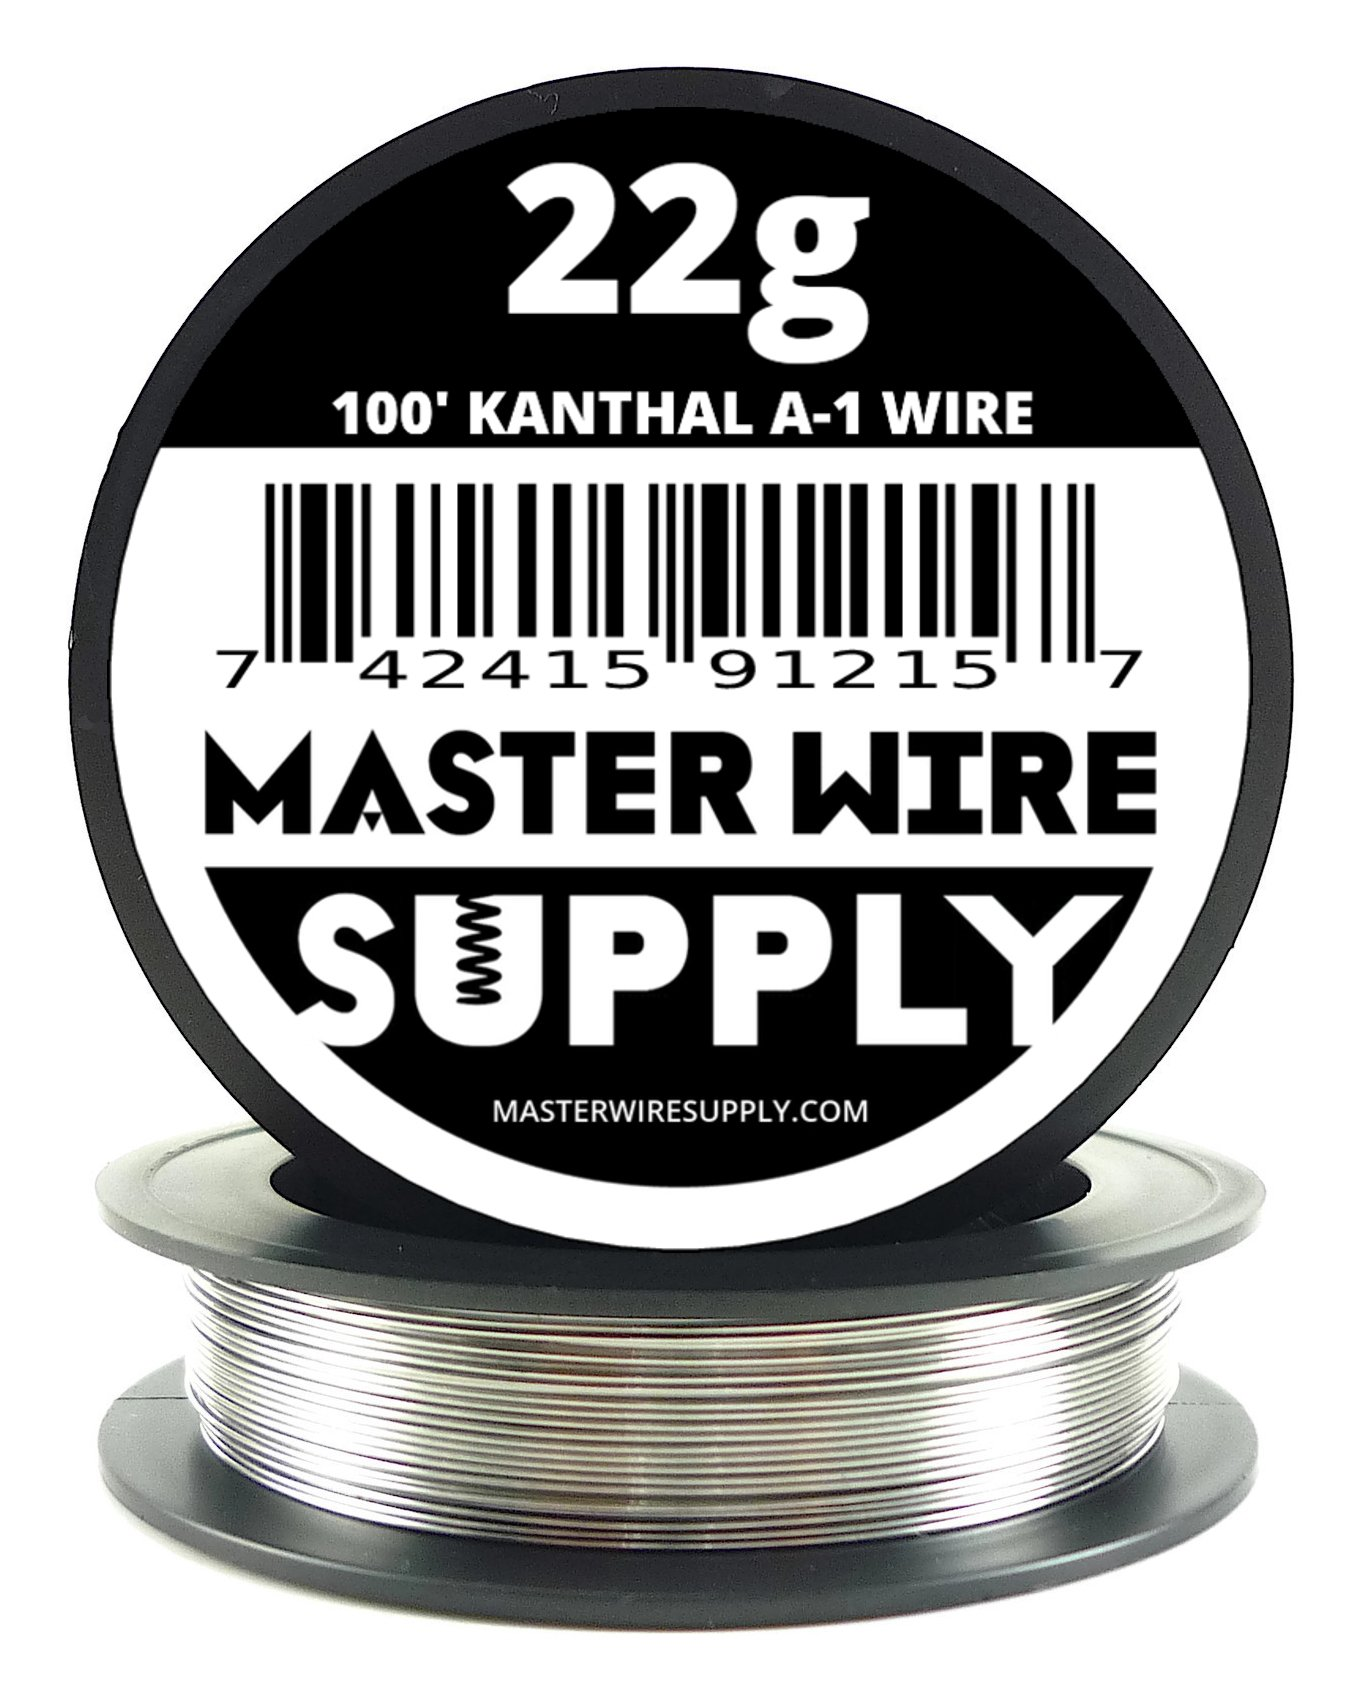 Kanthal A1-100' - 22 Gauge Resistance Wire